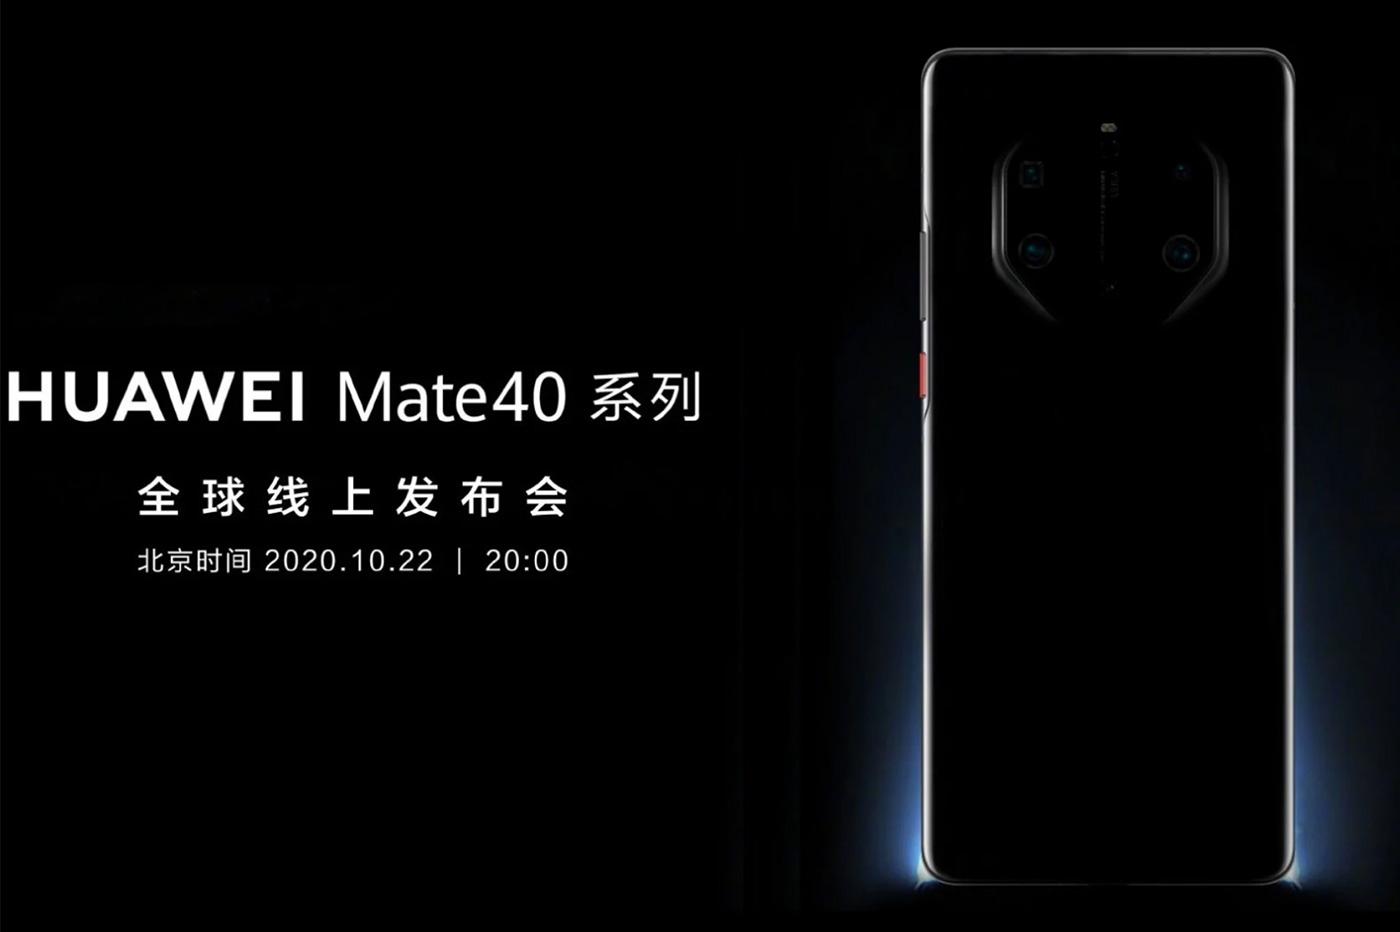 Huawei Mate 40 Pro module photo